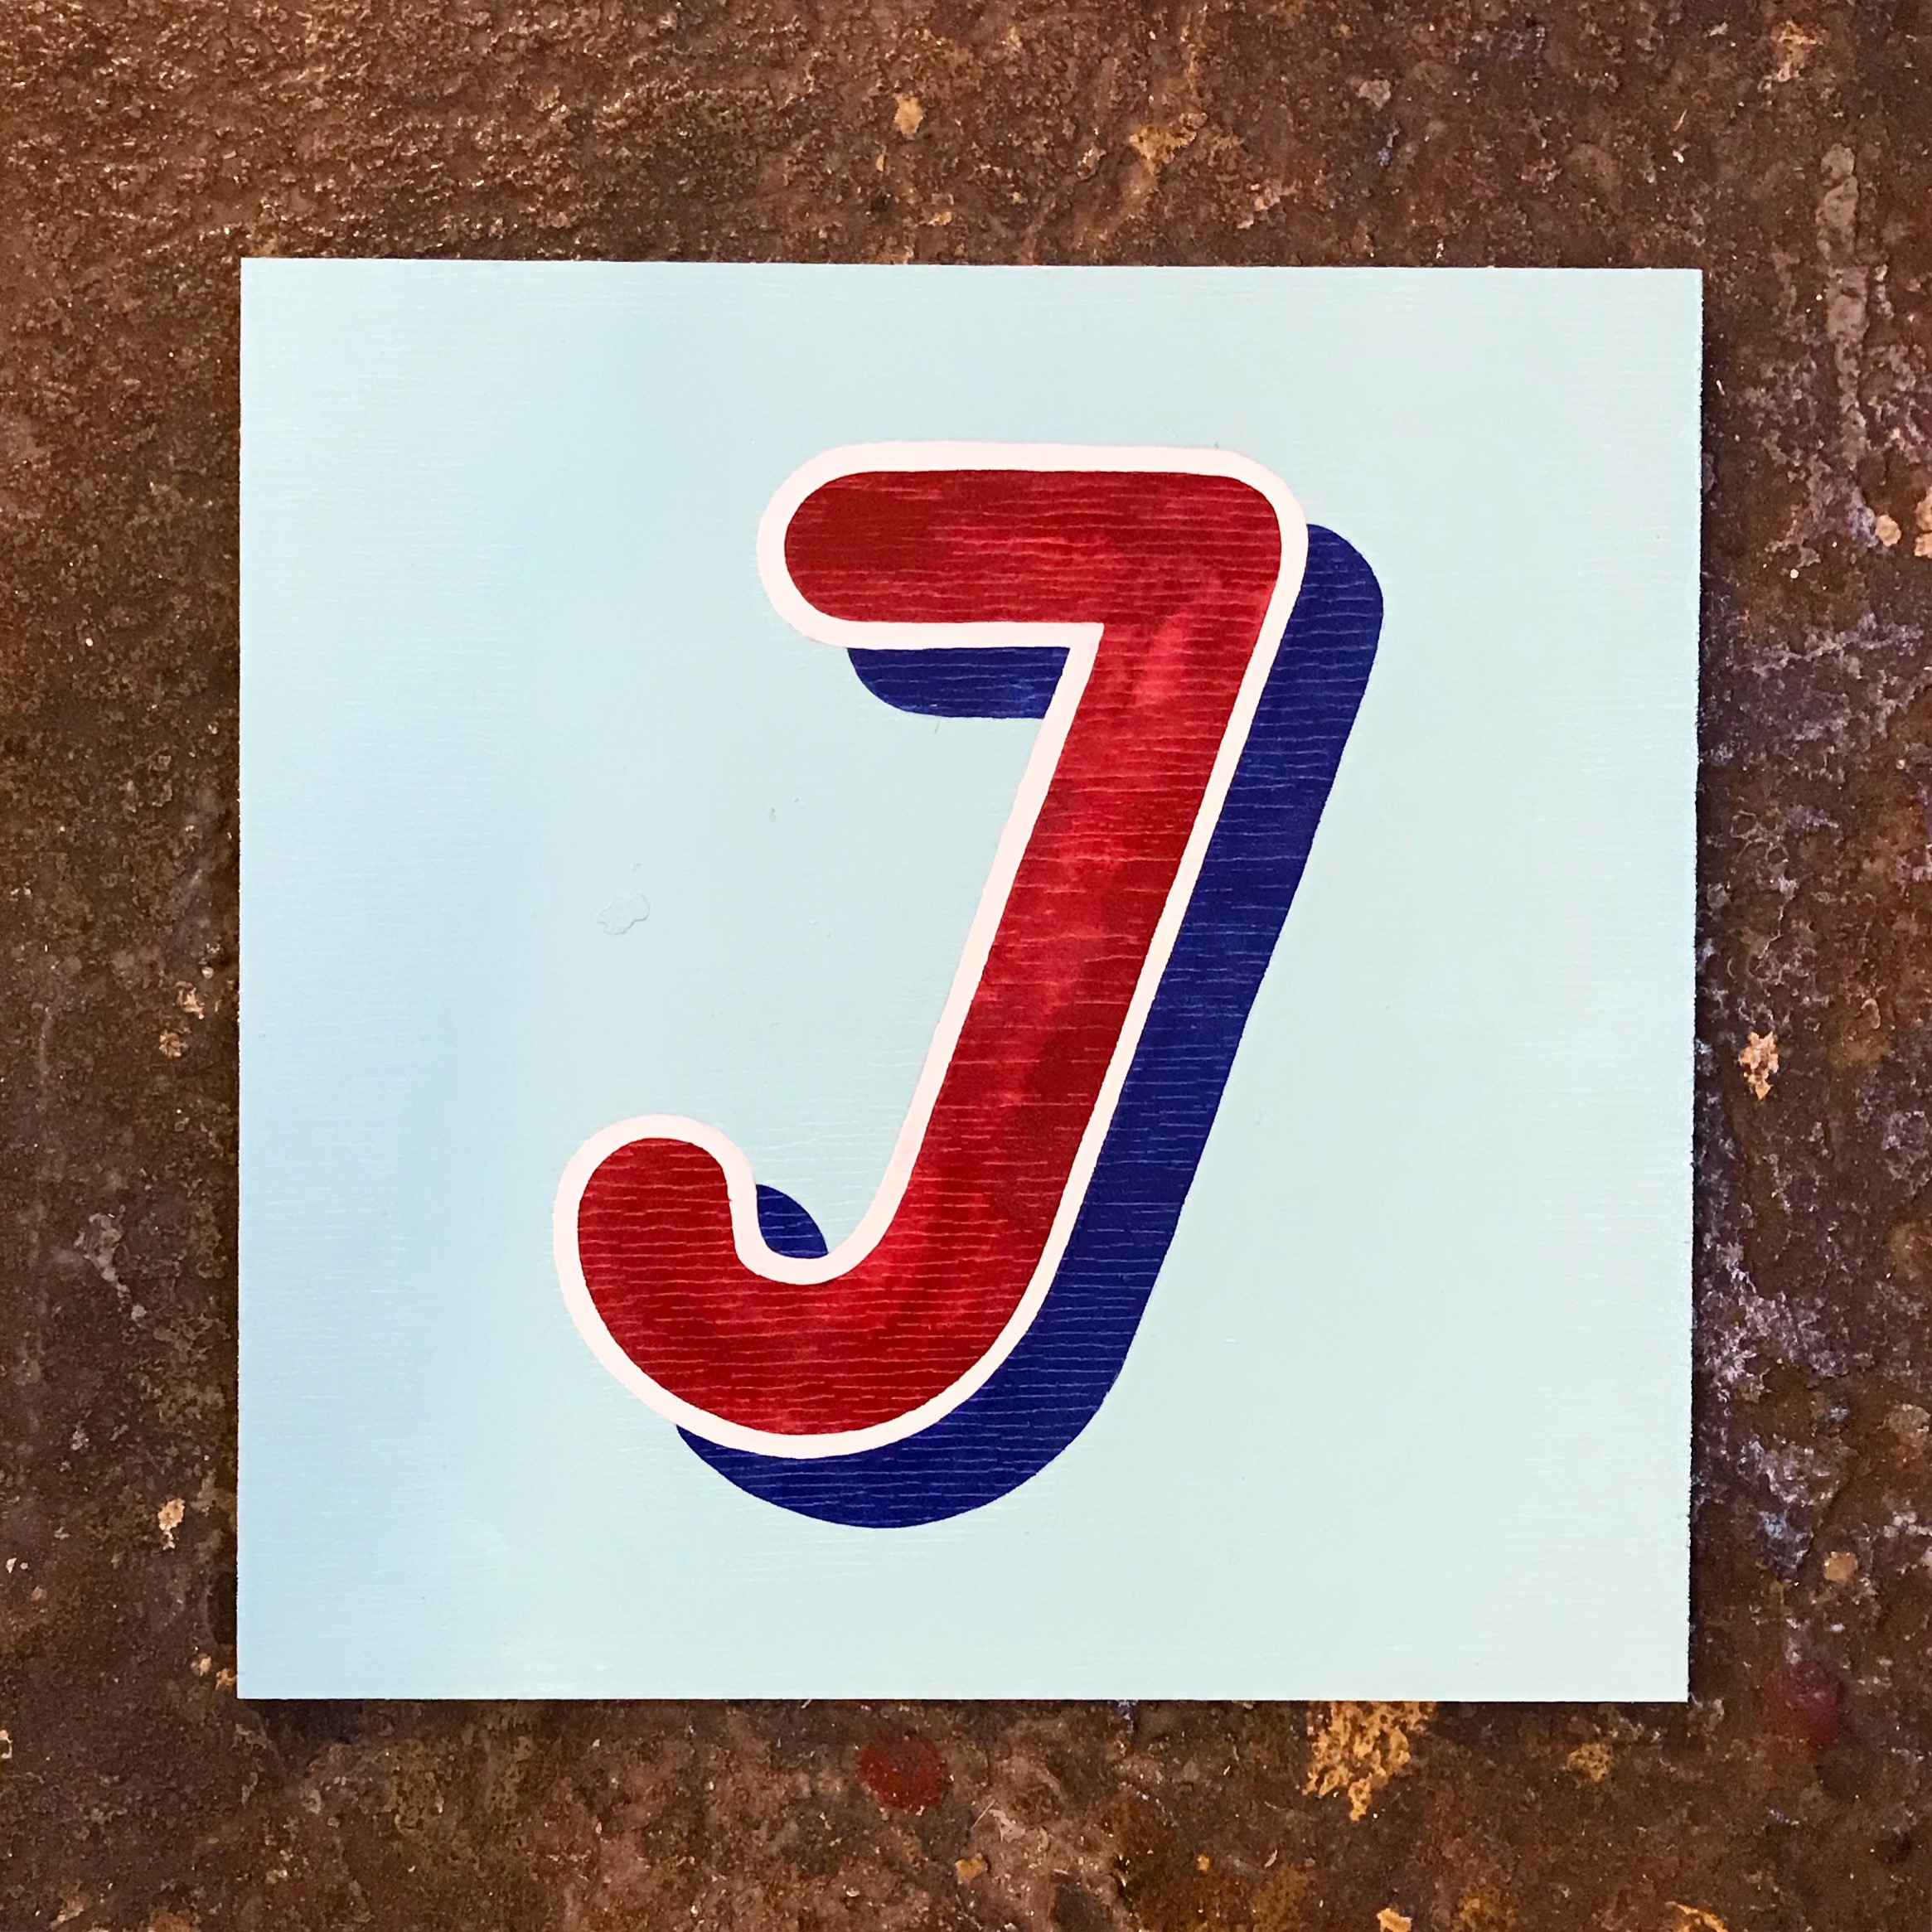 J_IMG_1461.JPG